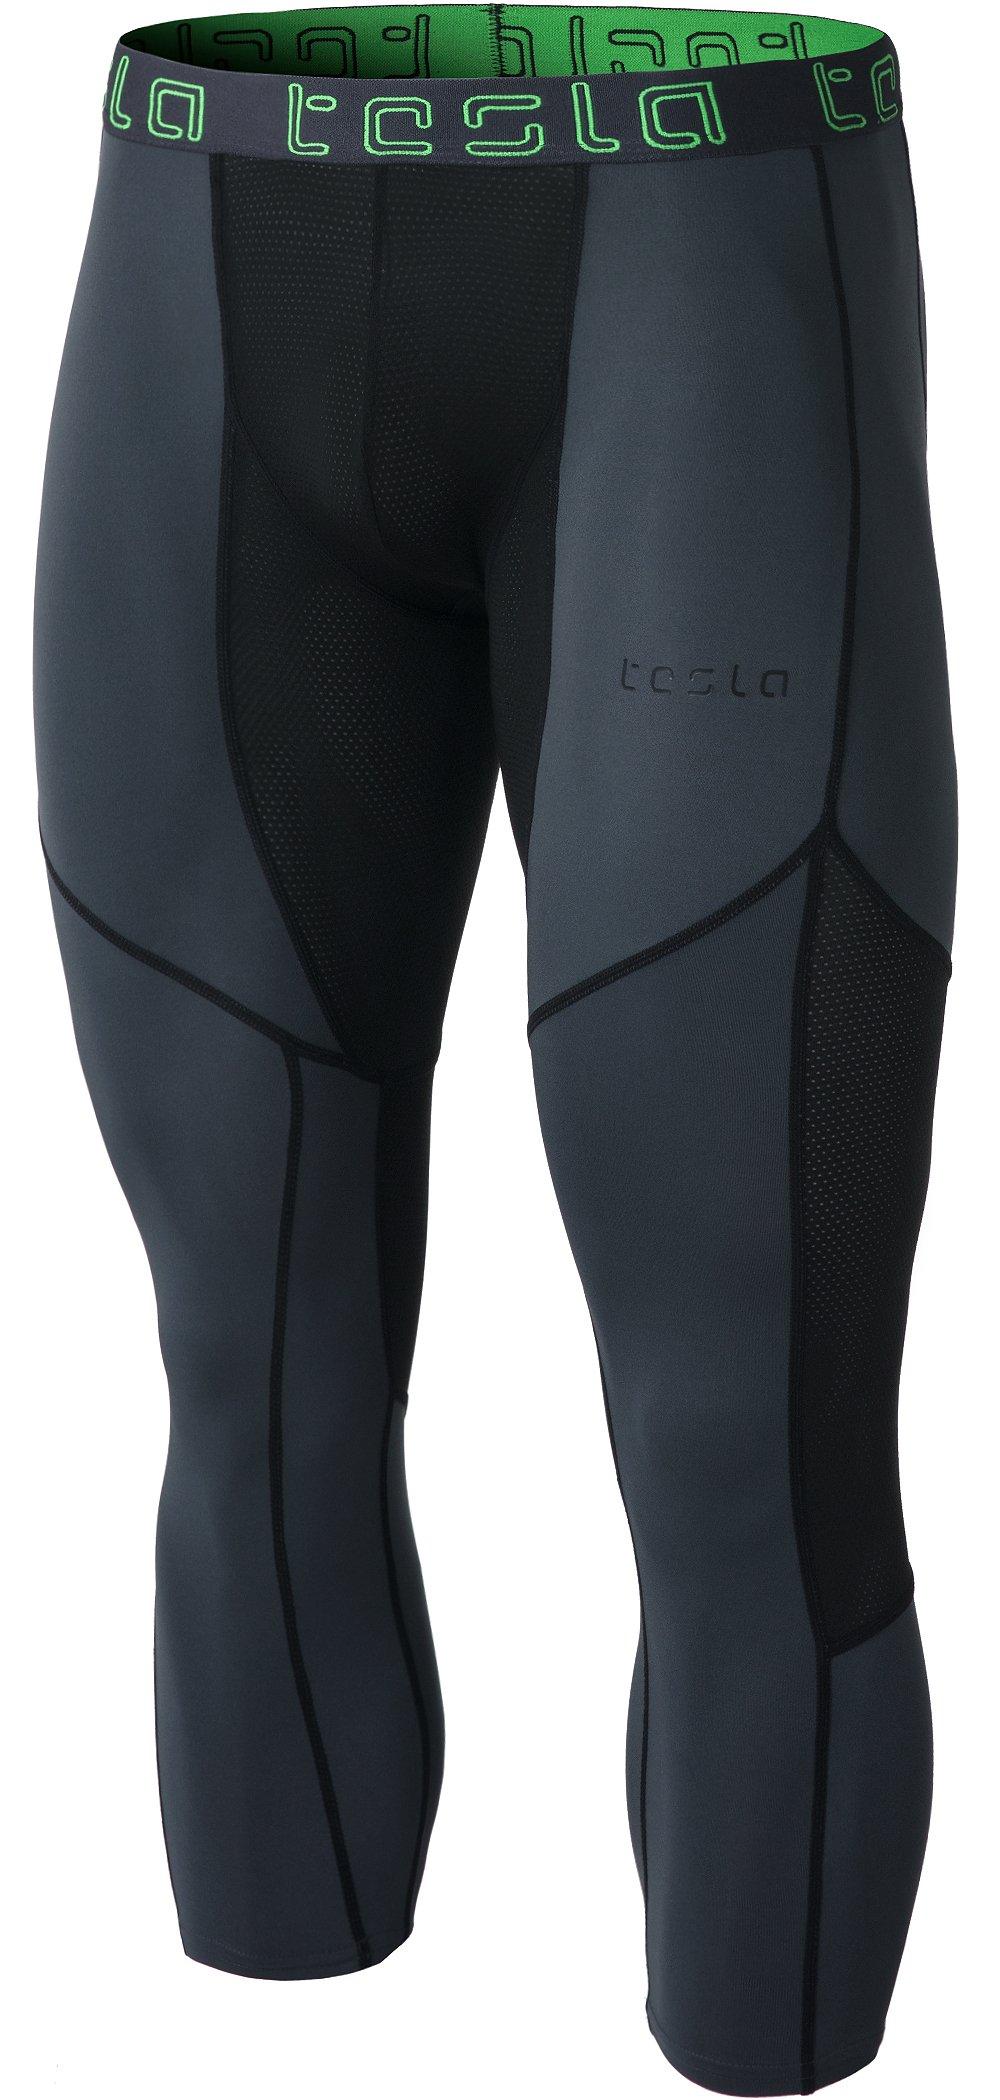 TSLA Men's Mesh-Panel Compression 3/4 Capri Pants Baselayer Cool Dry Sports Running Yoga Tights, Mesh(muc78) - Charcoal & Black, Large by TSLA